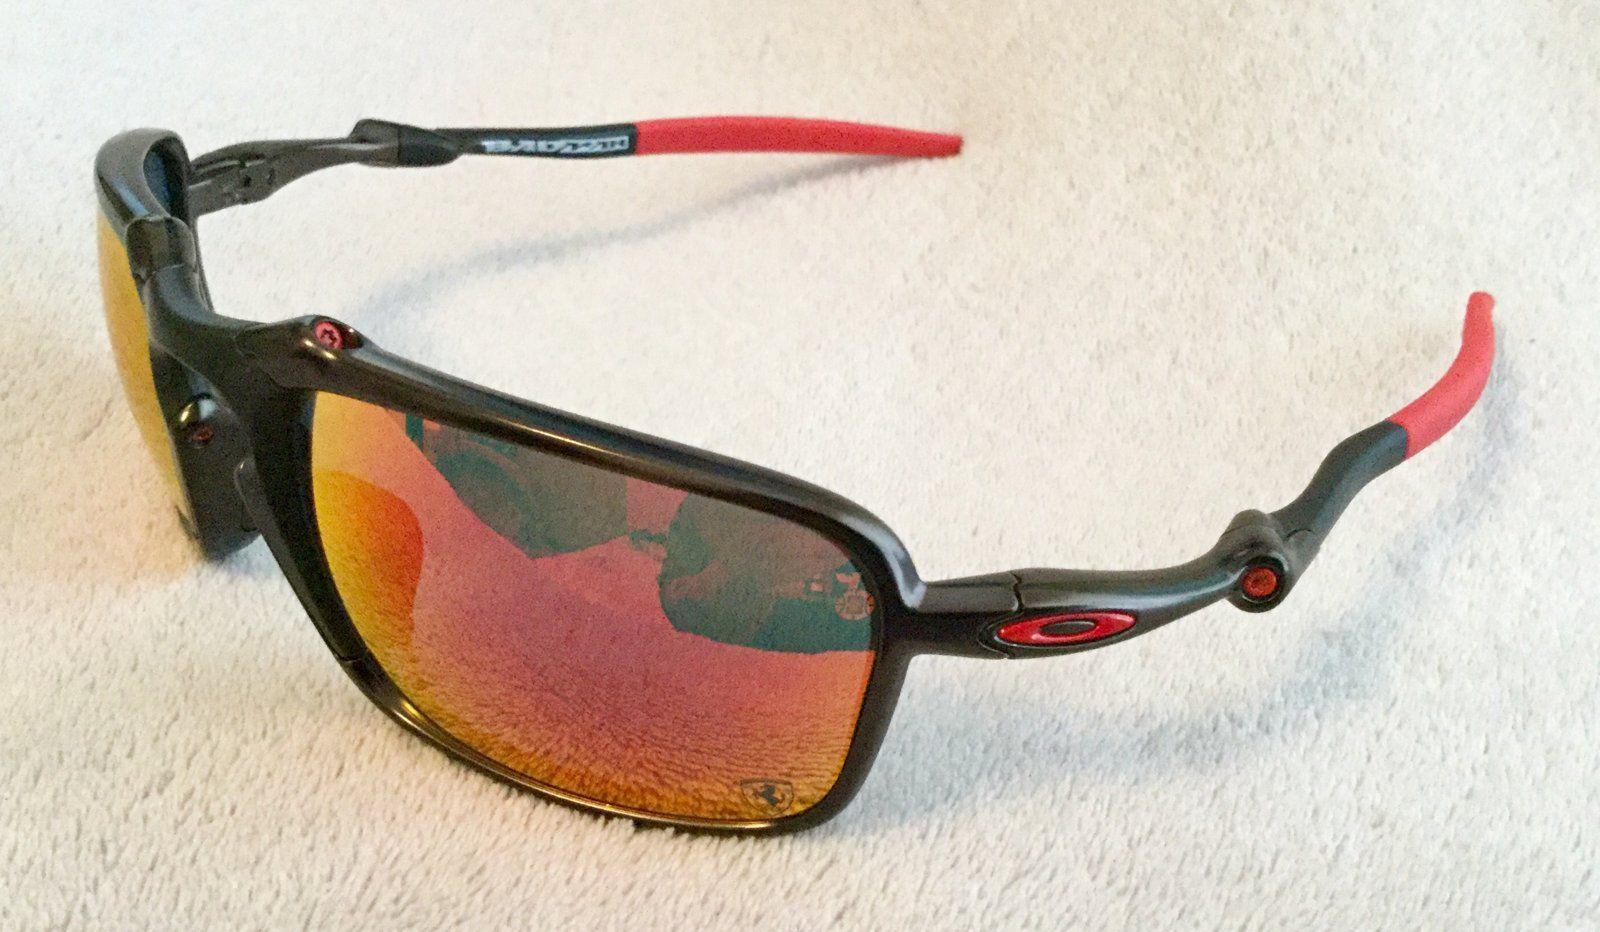 53aa2aae8a Oakley Badman Scuderia Ferrari Sunglasses (New) - EE12A881-F8A4-4F15-A997